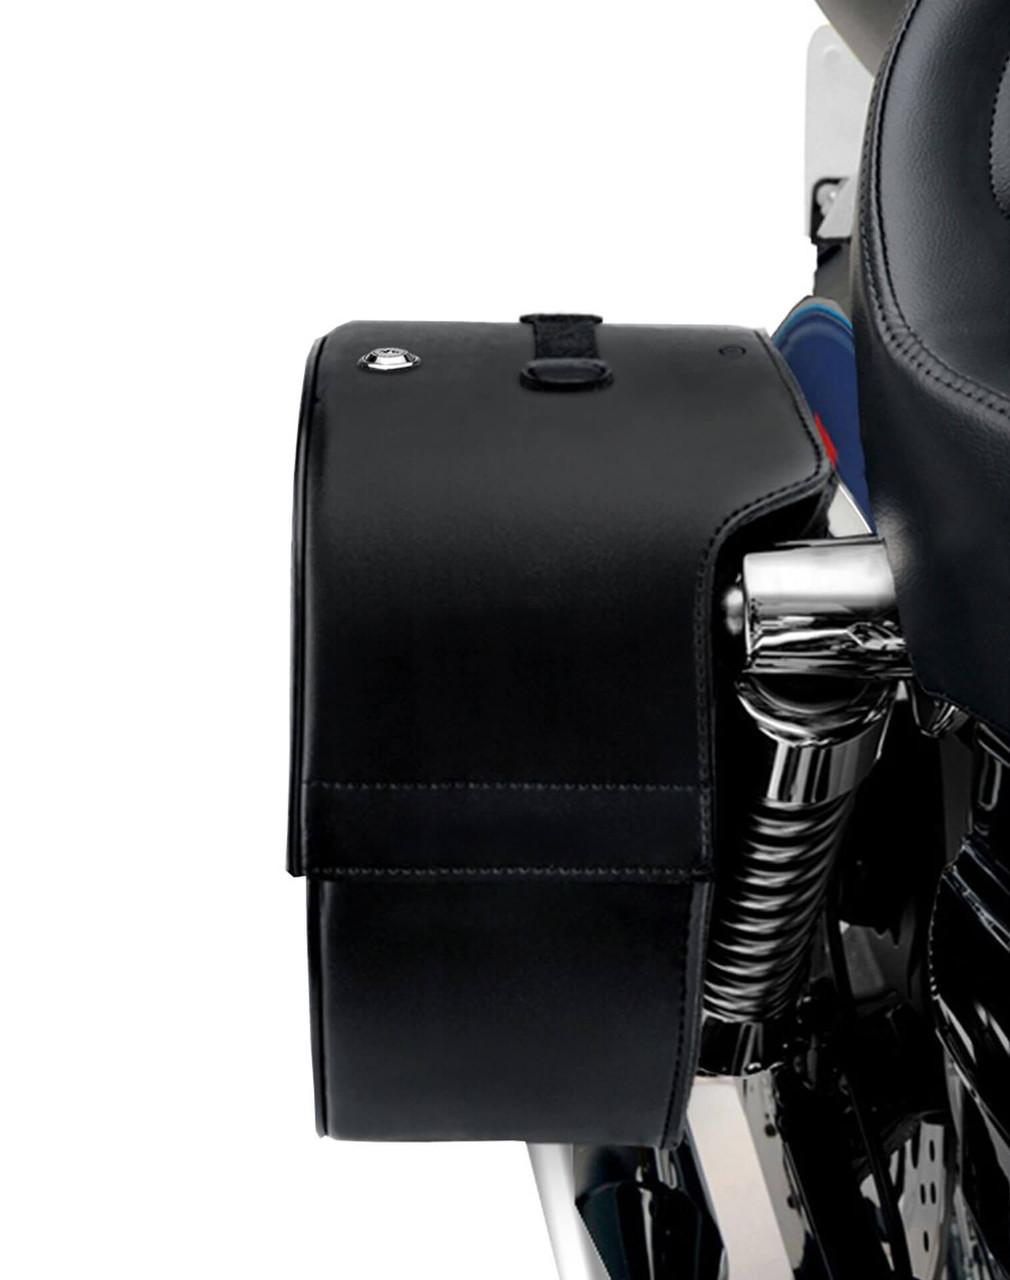 Honda 1100 Shadow Aero Viking Spear Shock Cutout Large Leather Motorcycle Saddlebags Shock Cutout View